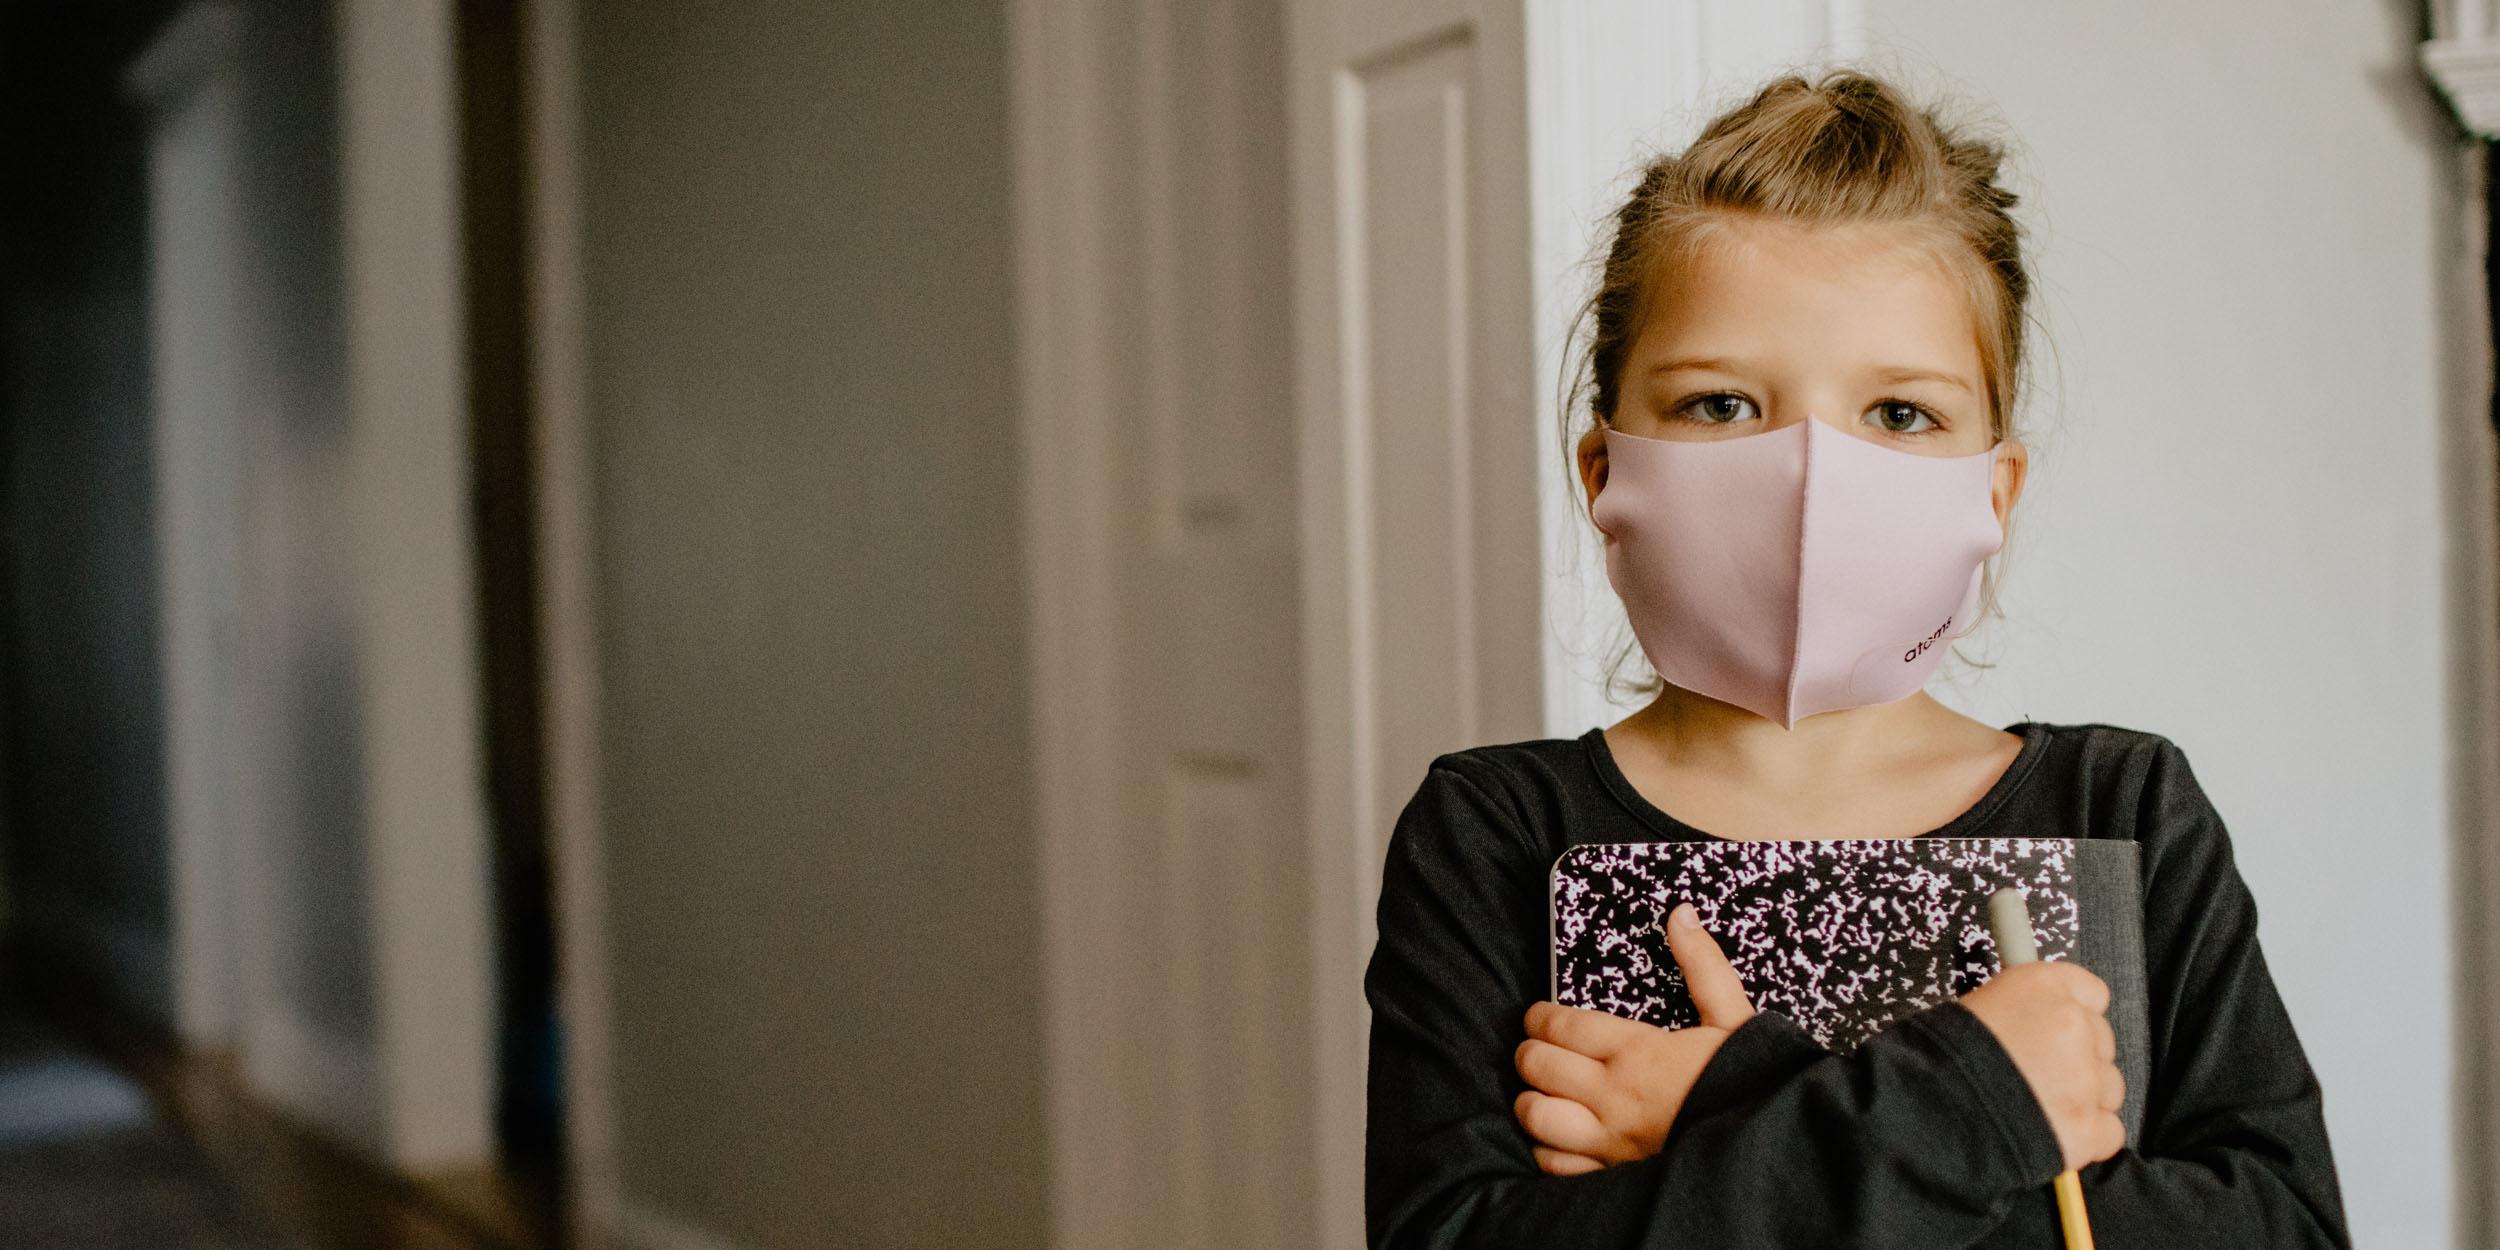 ls models preteen child little girl The Boston Globe